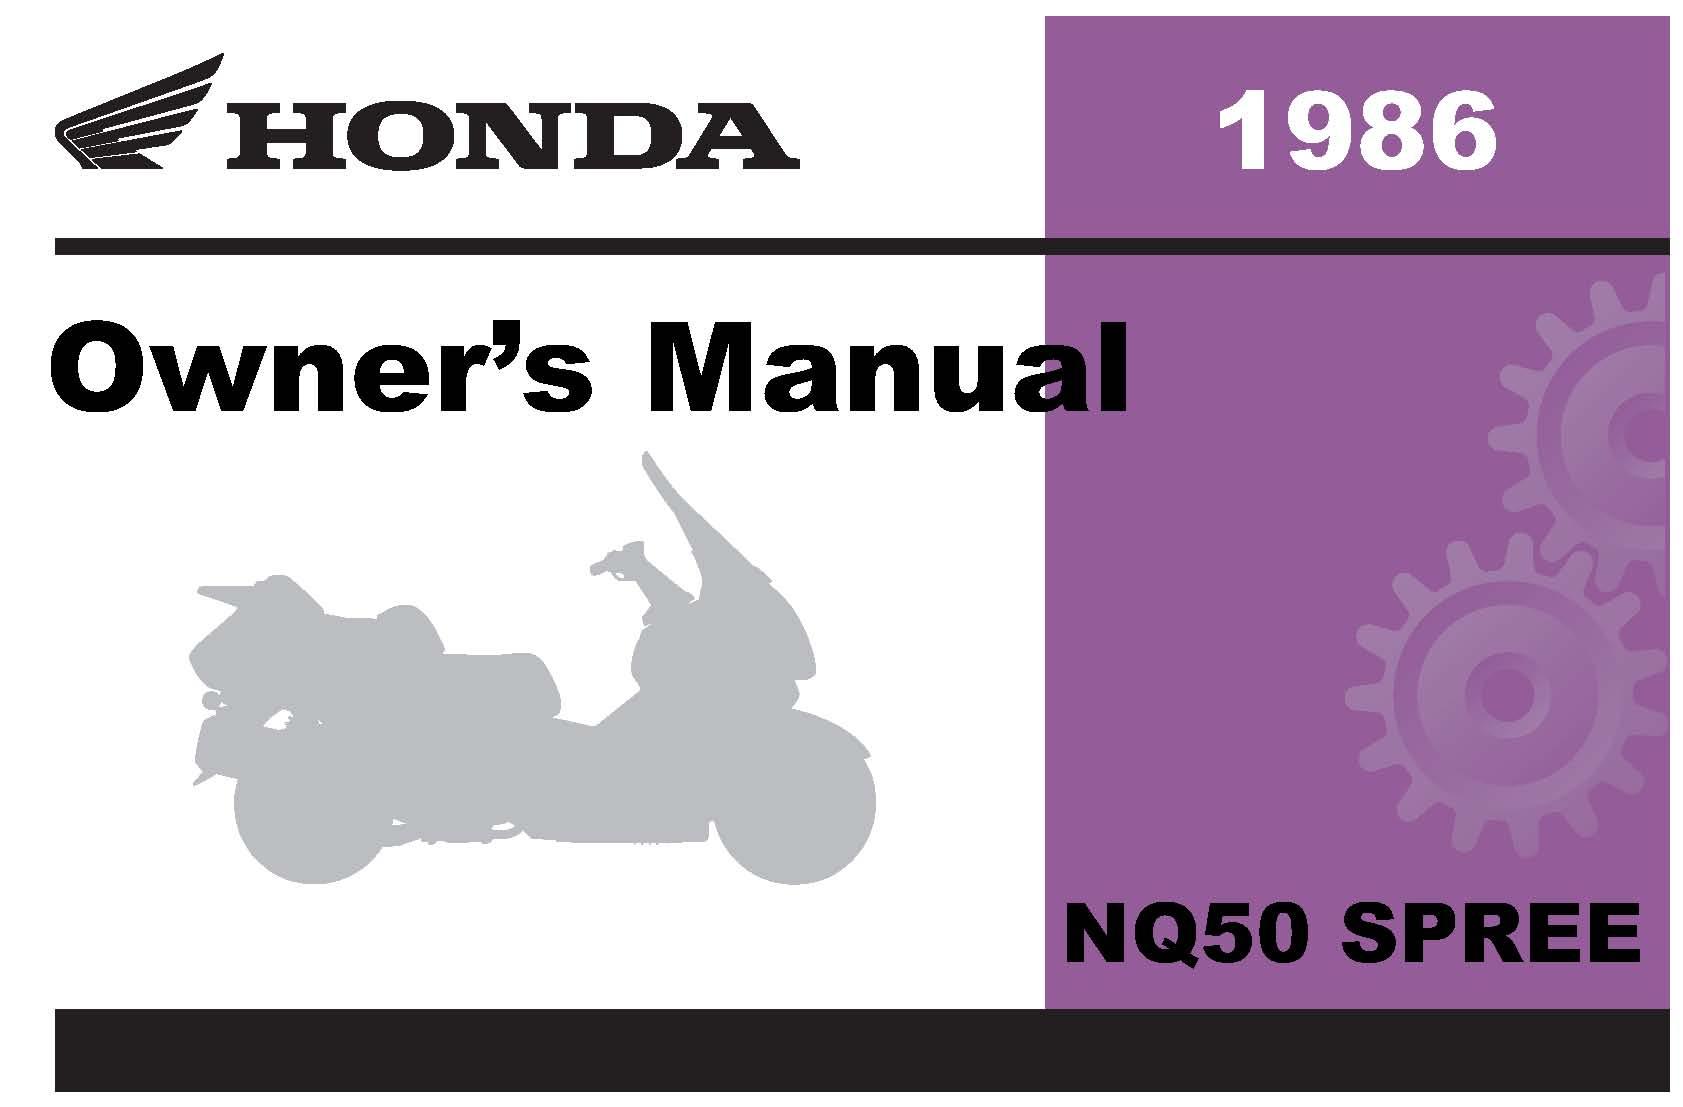 1986 honda spree repair manual best setting instruction guide u2022 rh ourk9 co